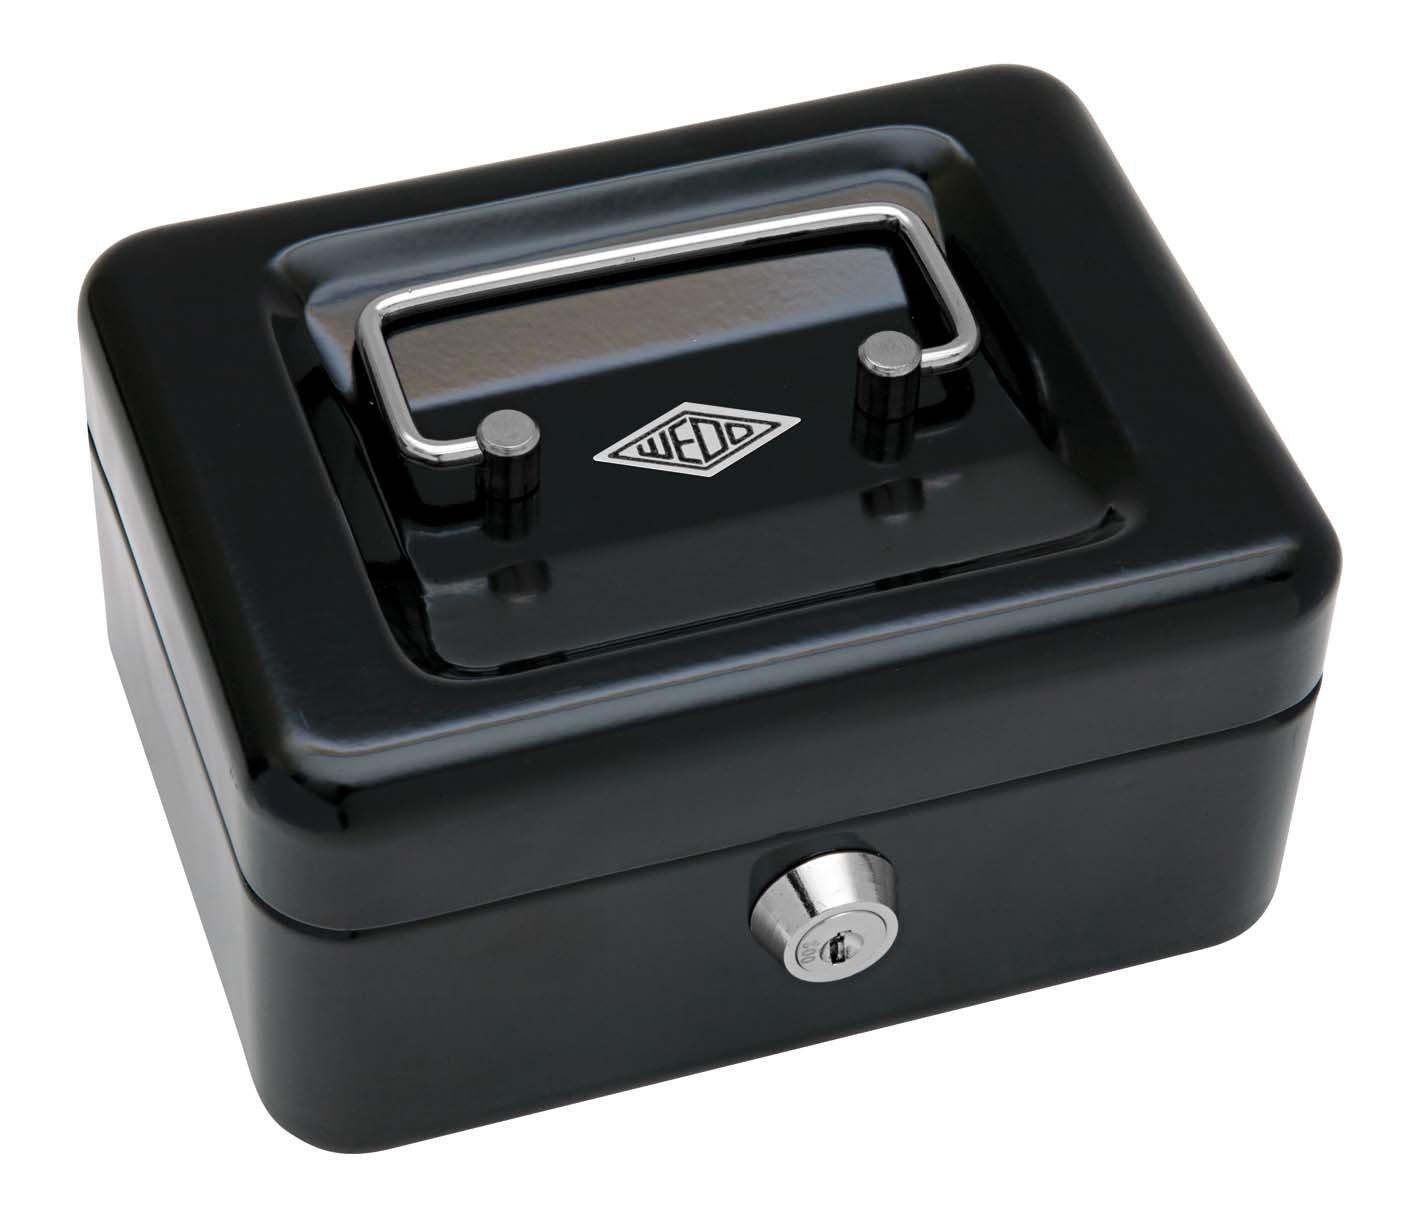 Wedo 145121H - Caja de caudales x con clip, talla 1 (15,2 x caudales 11,5 x 8 cm), negro 4407a0